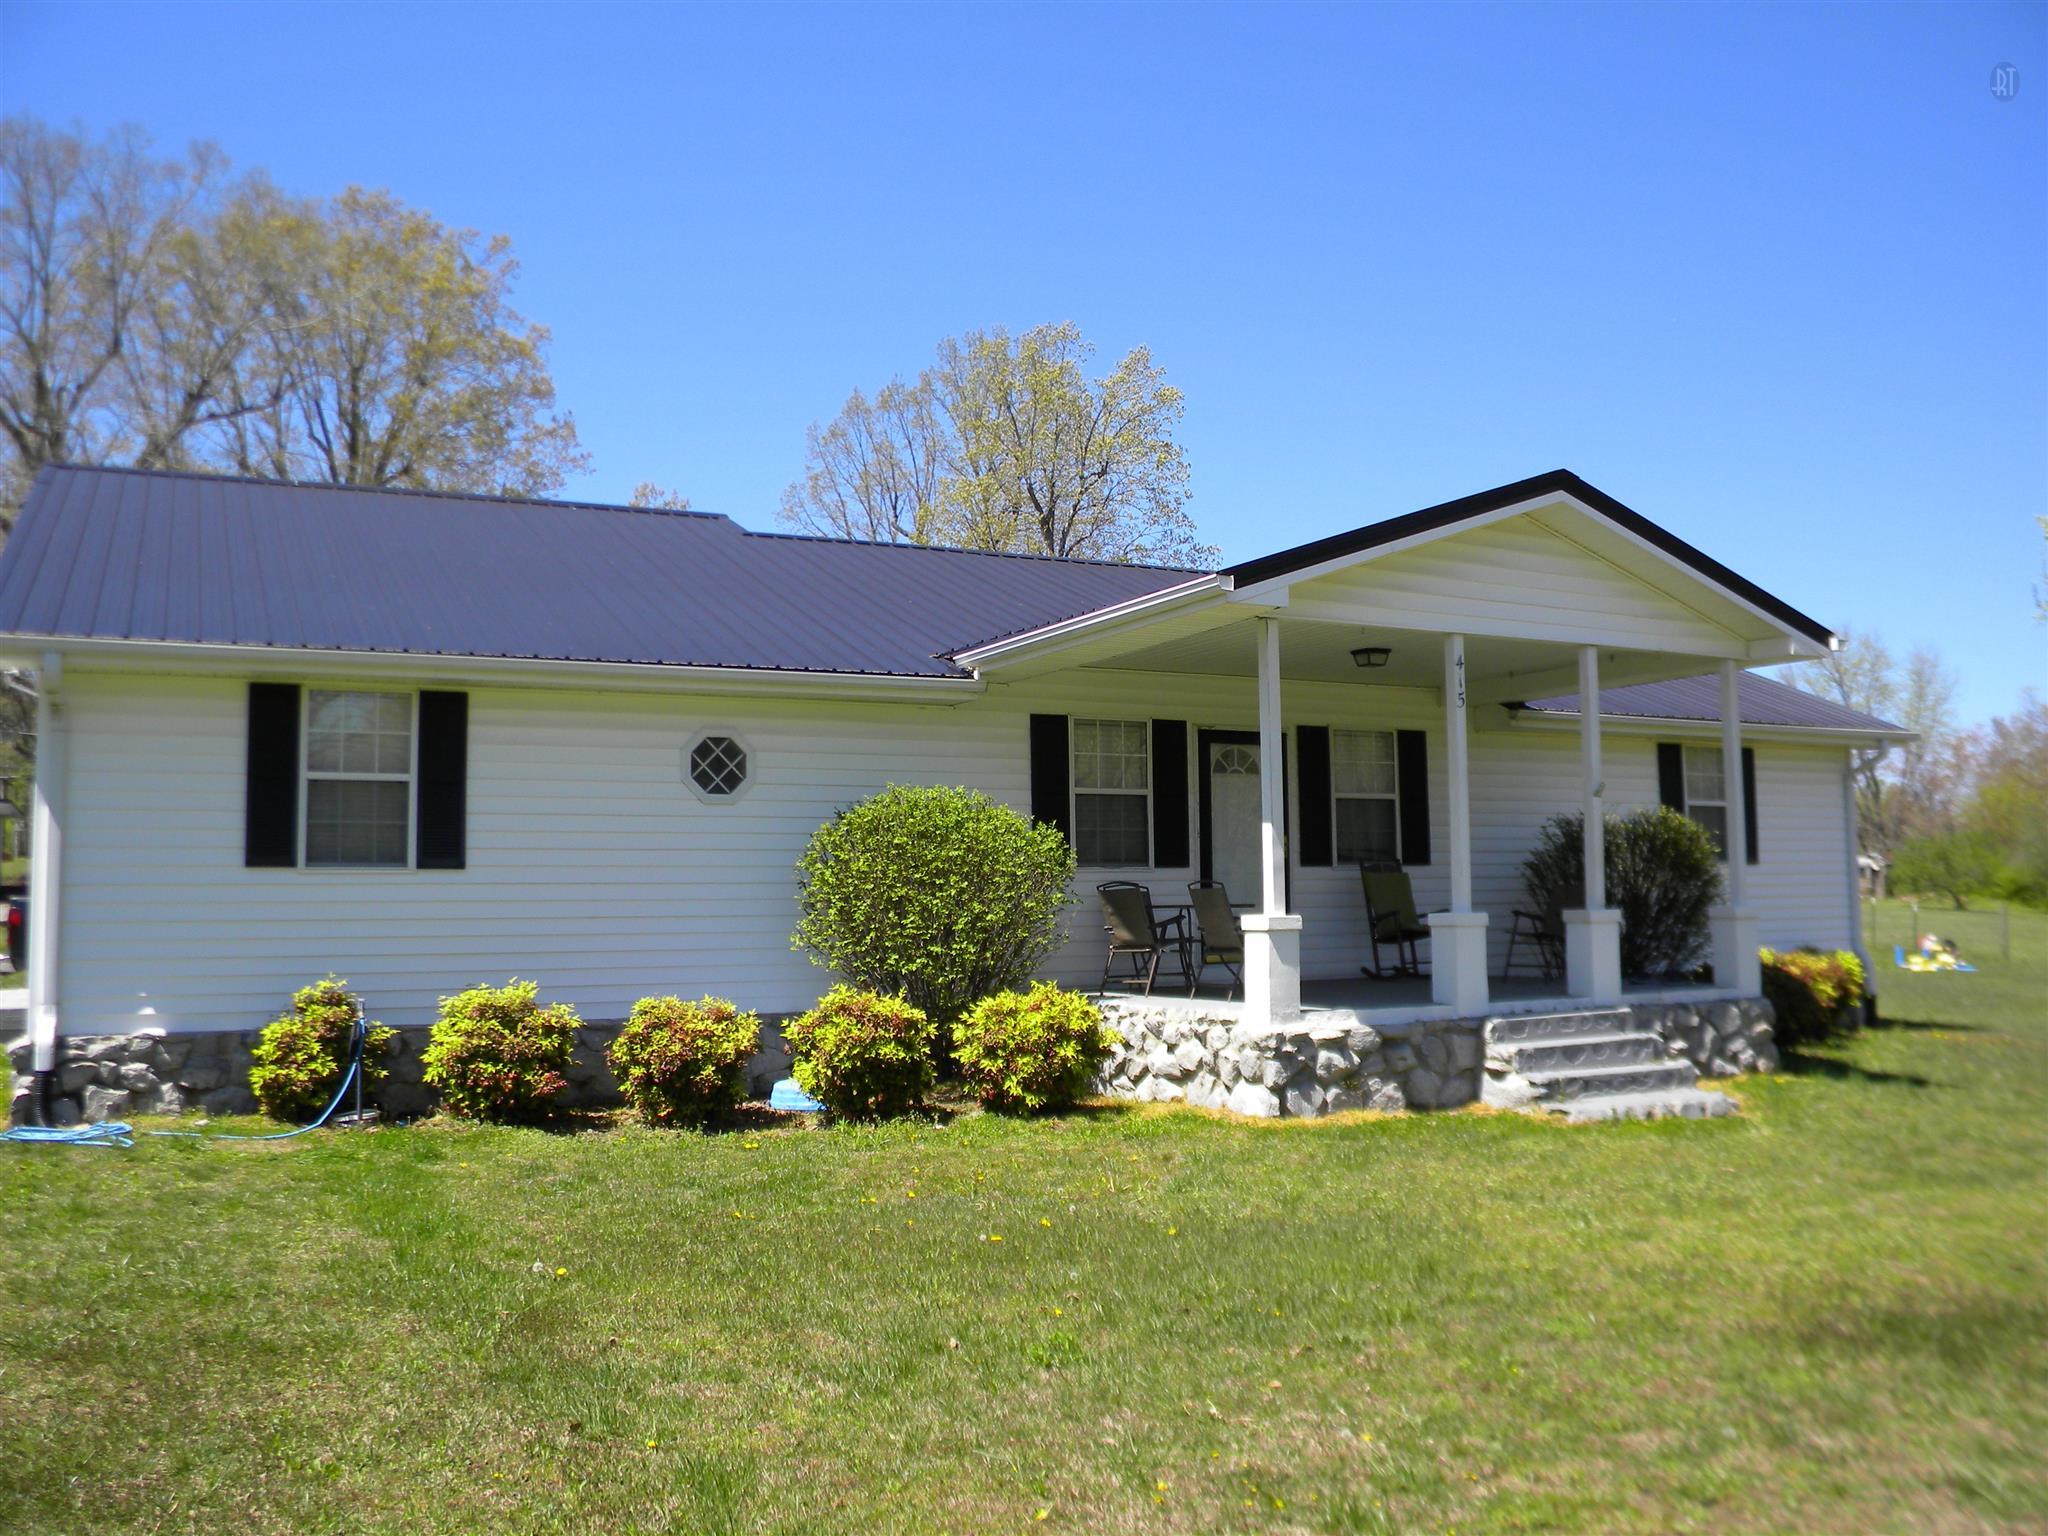 415 Main St, Mc Ewen, TN